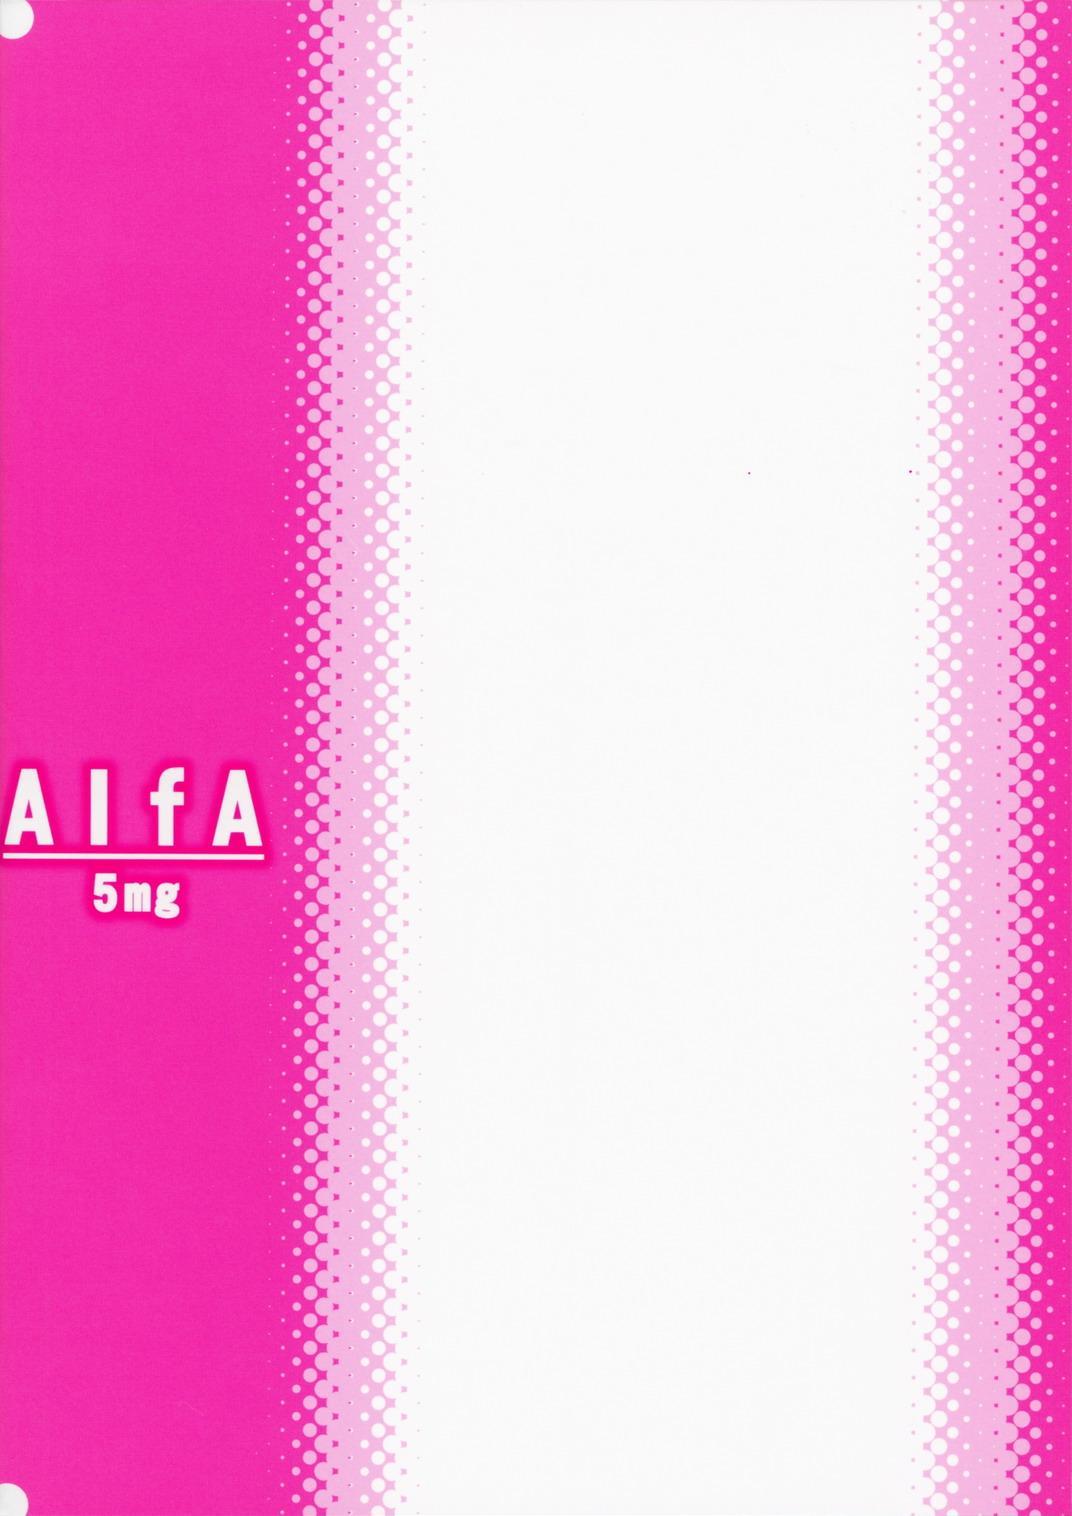 AlfA 5mg 41